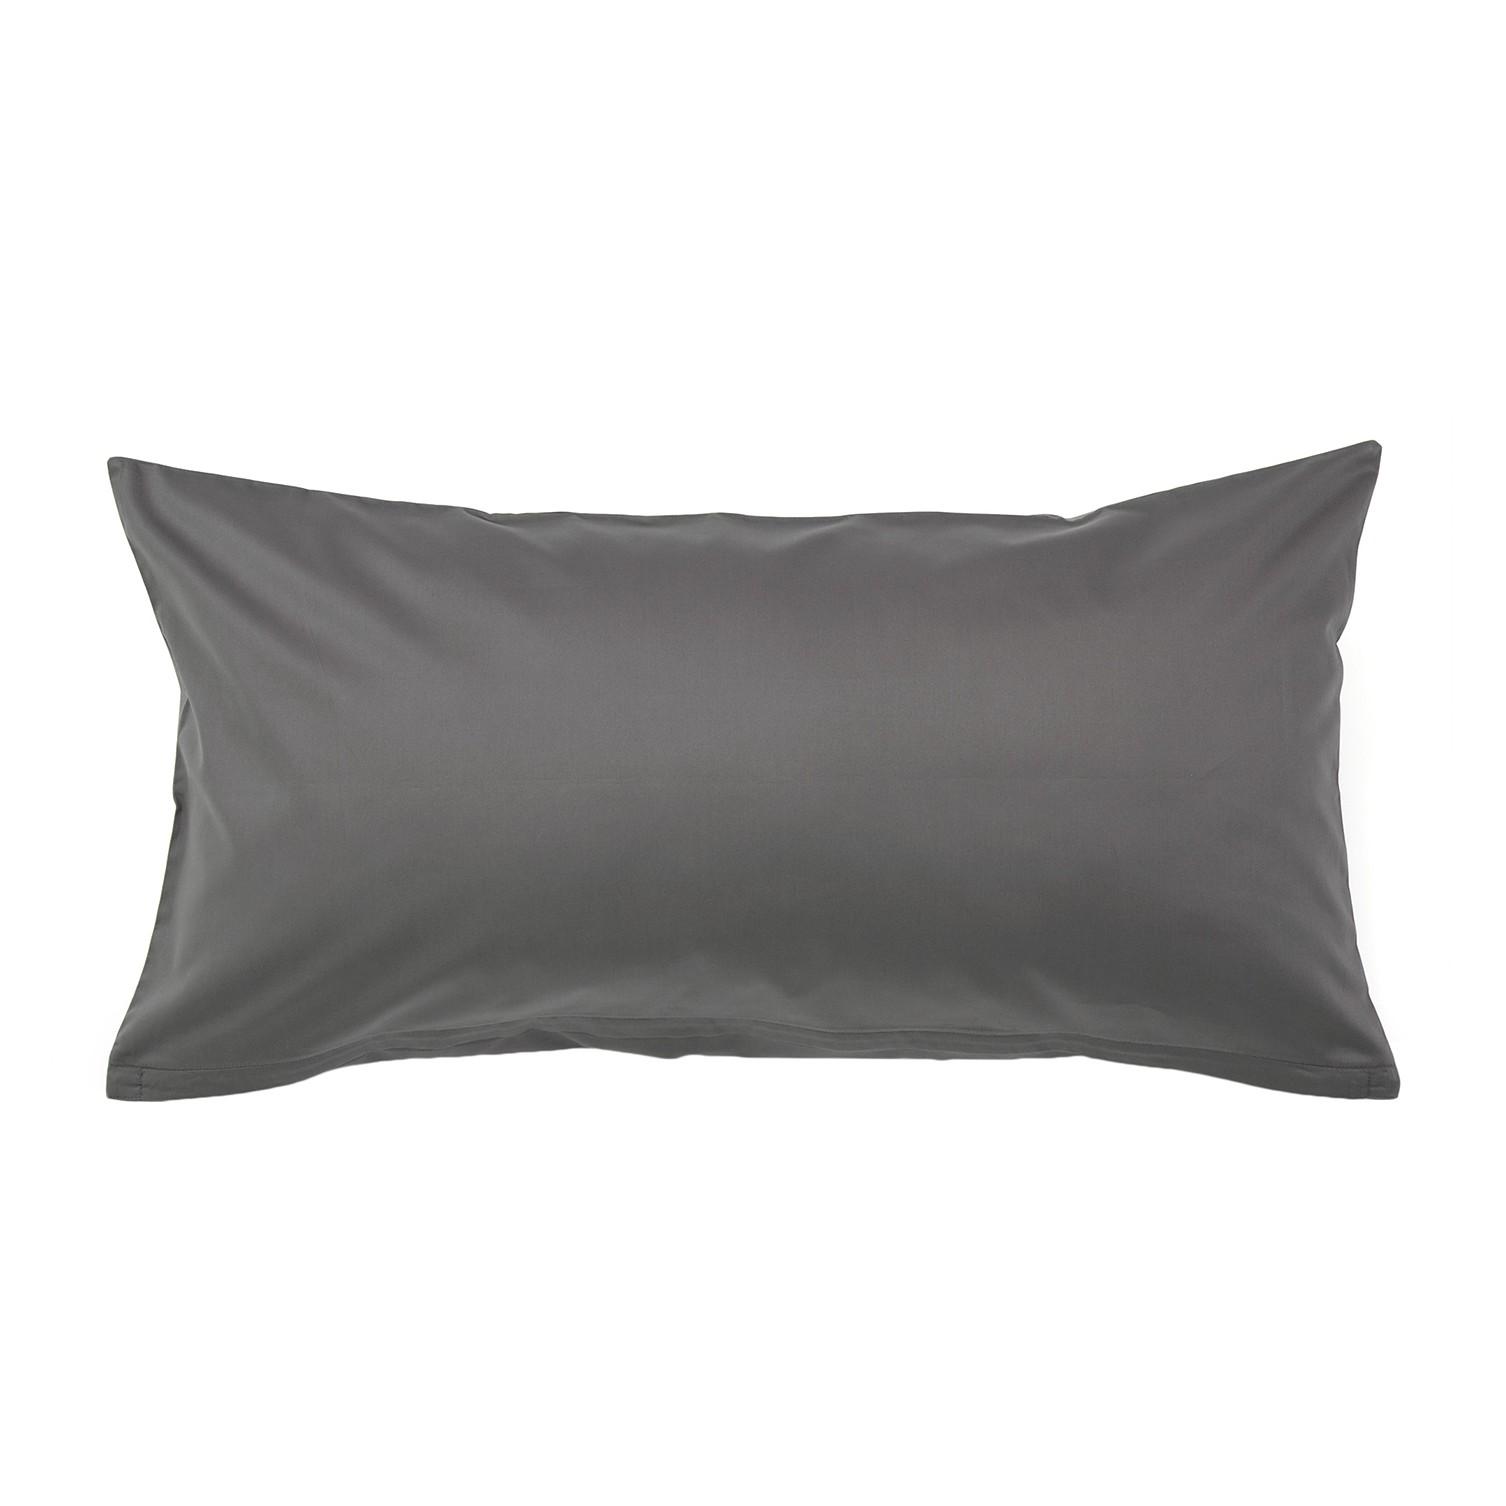 kopfkissenbezug 40 x 80. Black Bedroom Furniture Sets. Home Design Ideas